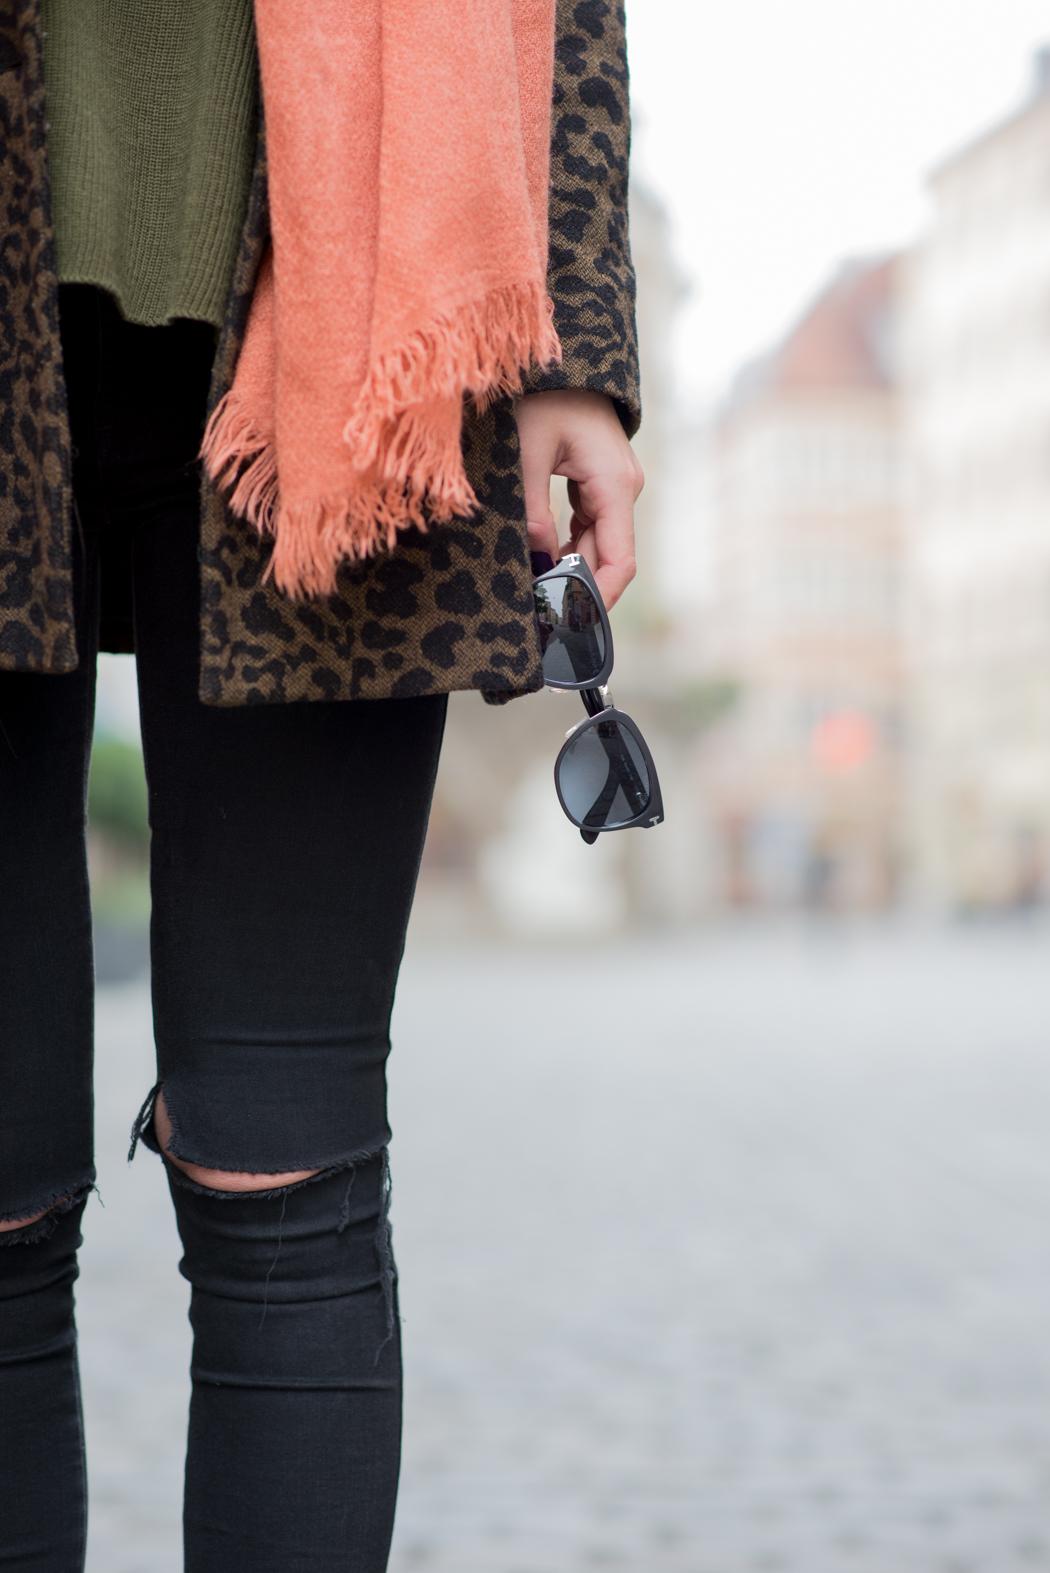 Münchner-Fashionblog-Alexander-Wang-Bag-Leomantel-8-10